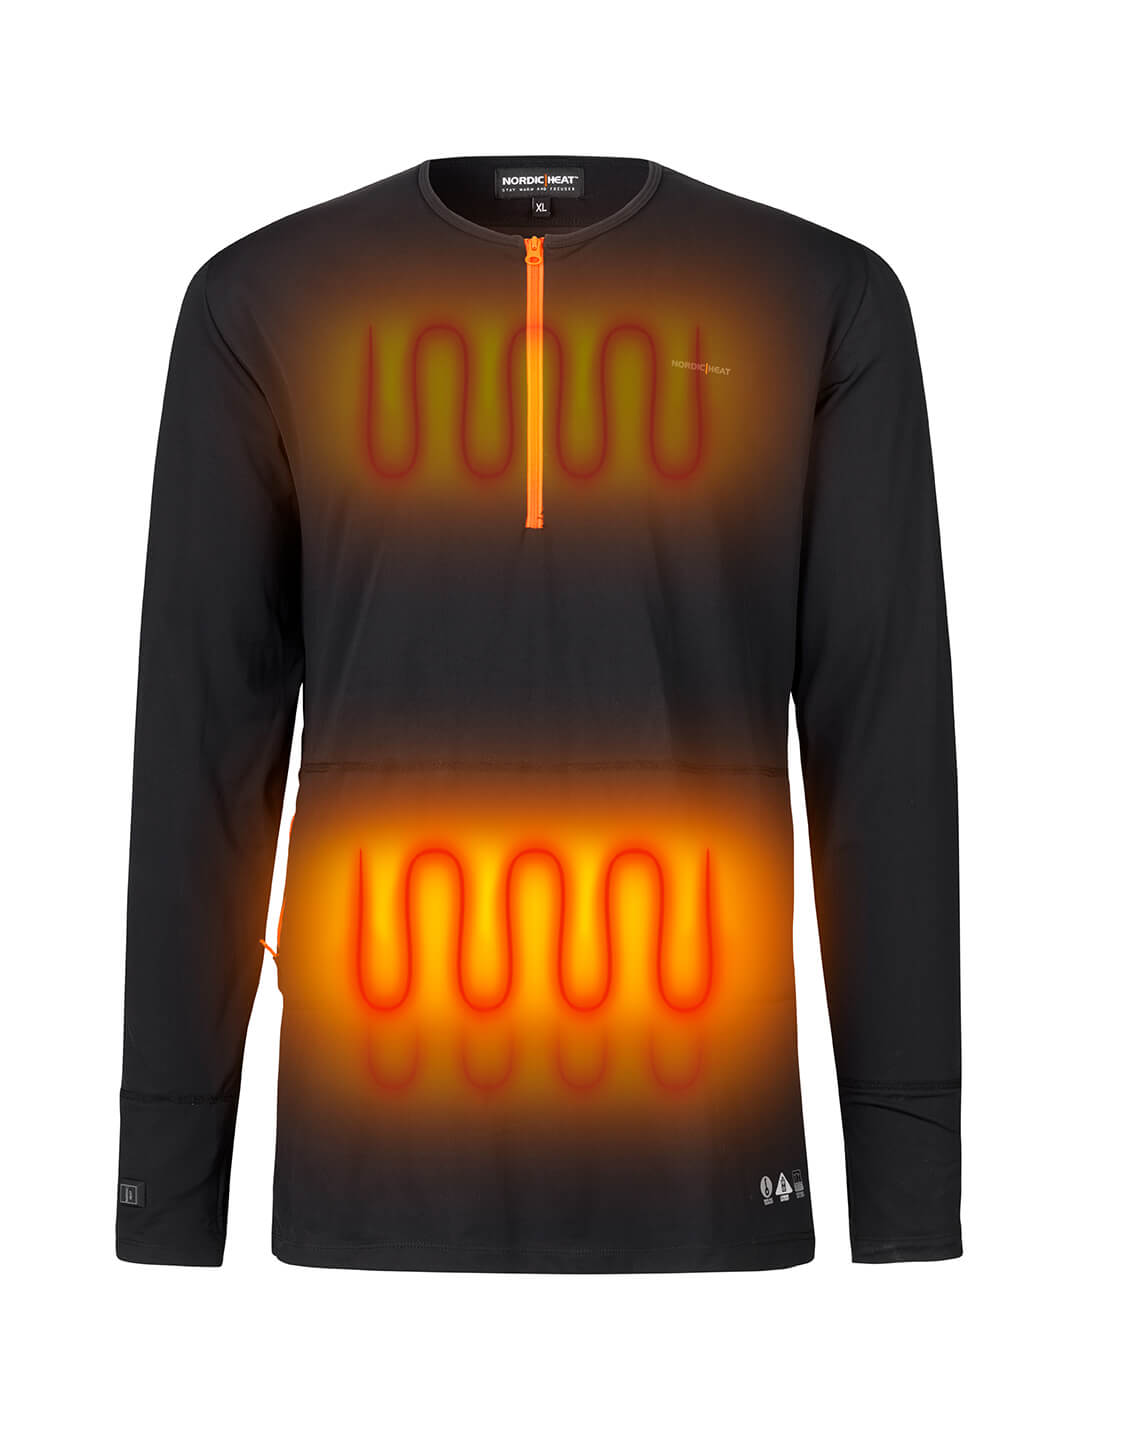 Undertøj med varme TOP